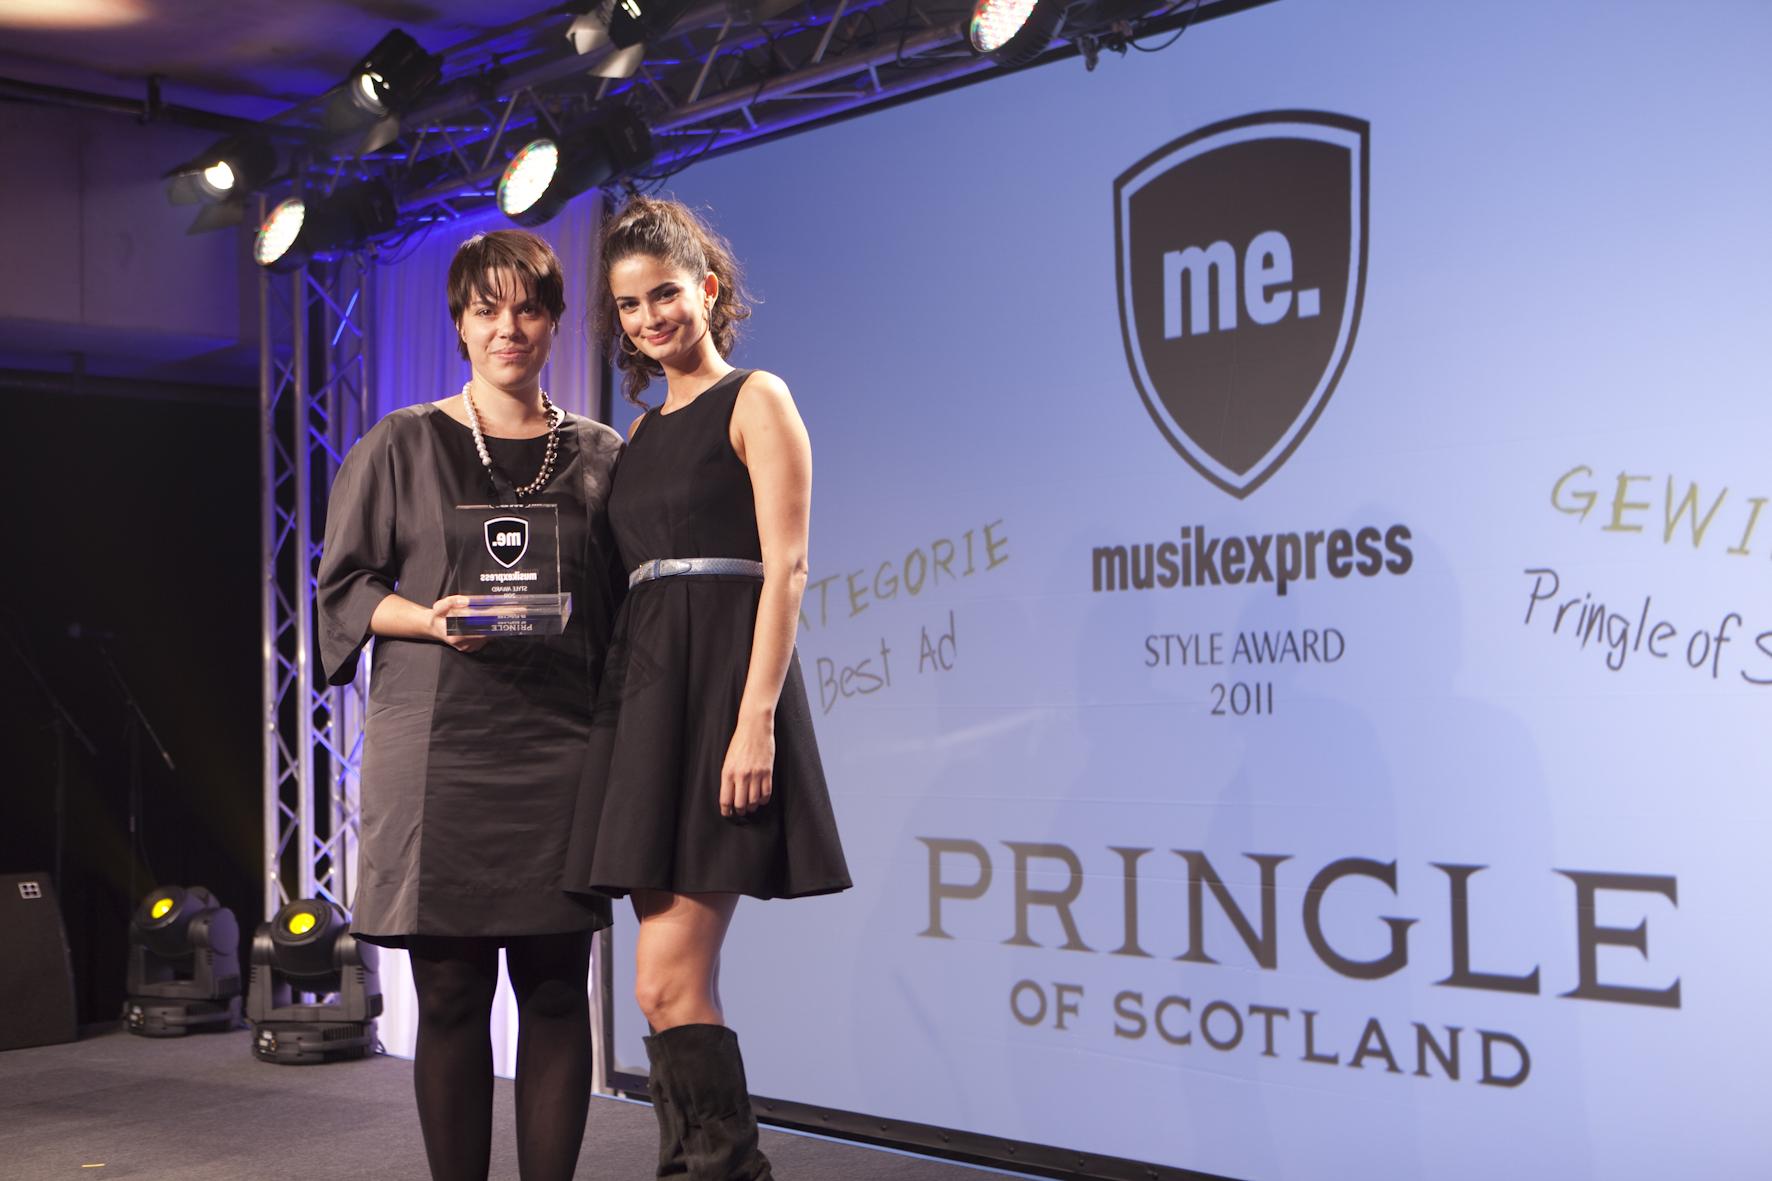 Ingrid Meyer-Lohrmann (Pringle of Scotland) mit Shermine Sharivar